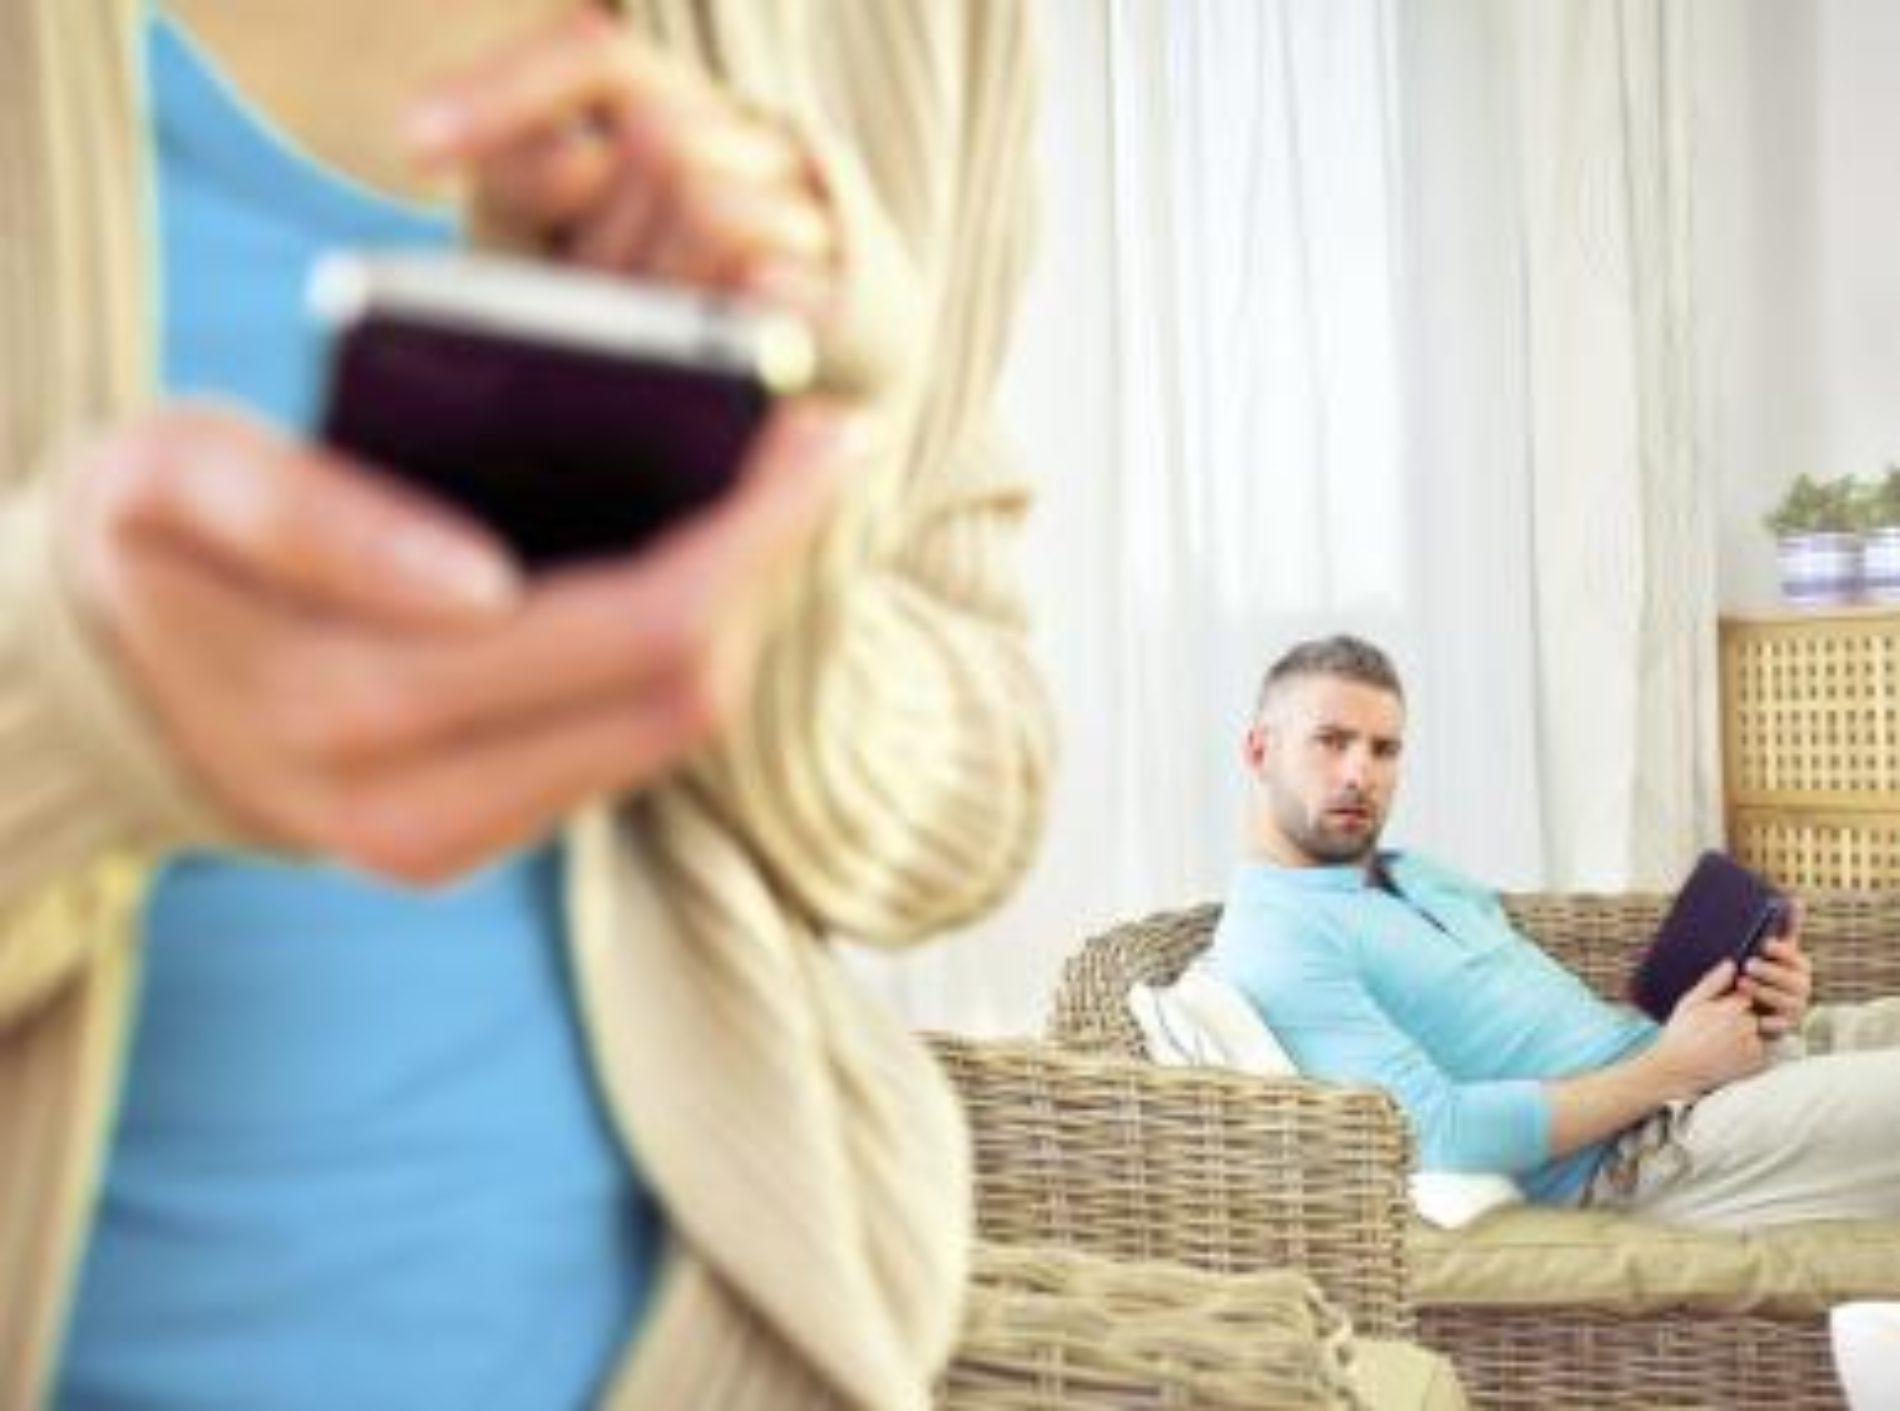 Wife Speaks Up After Finding Husband On Grindr